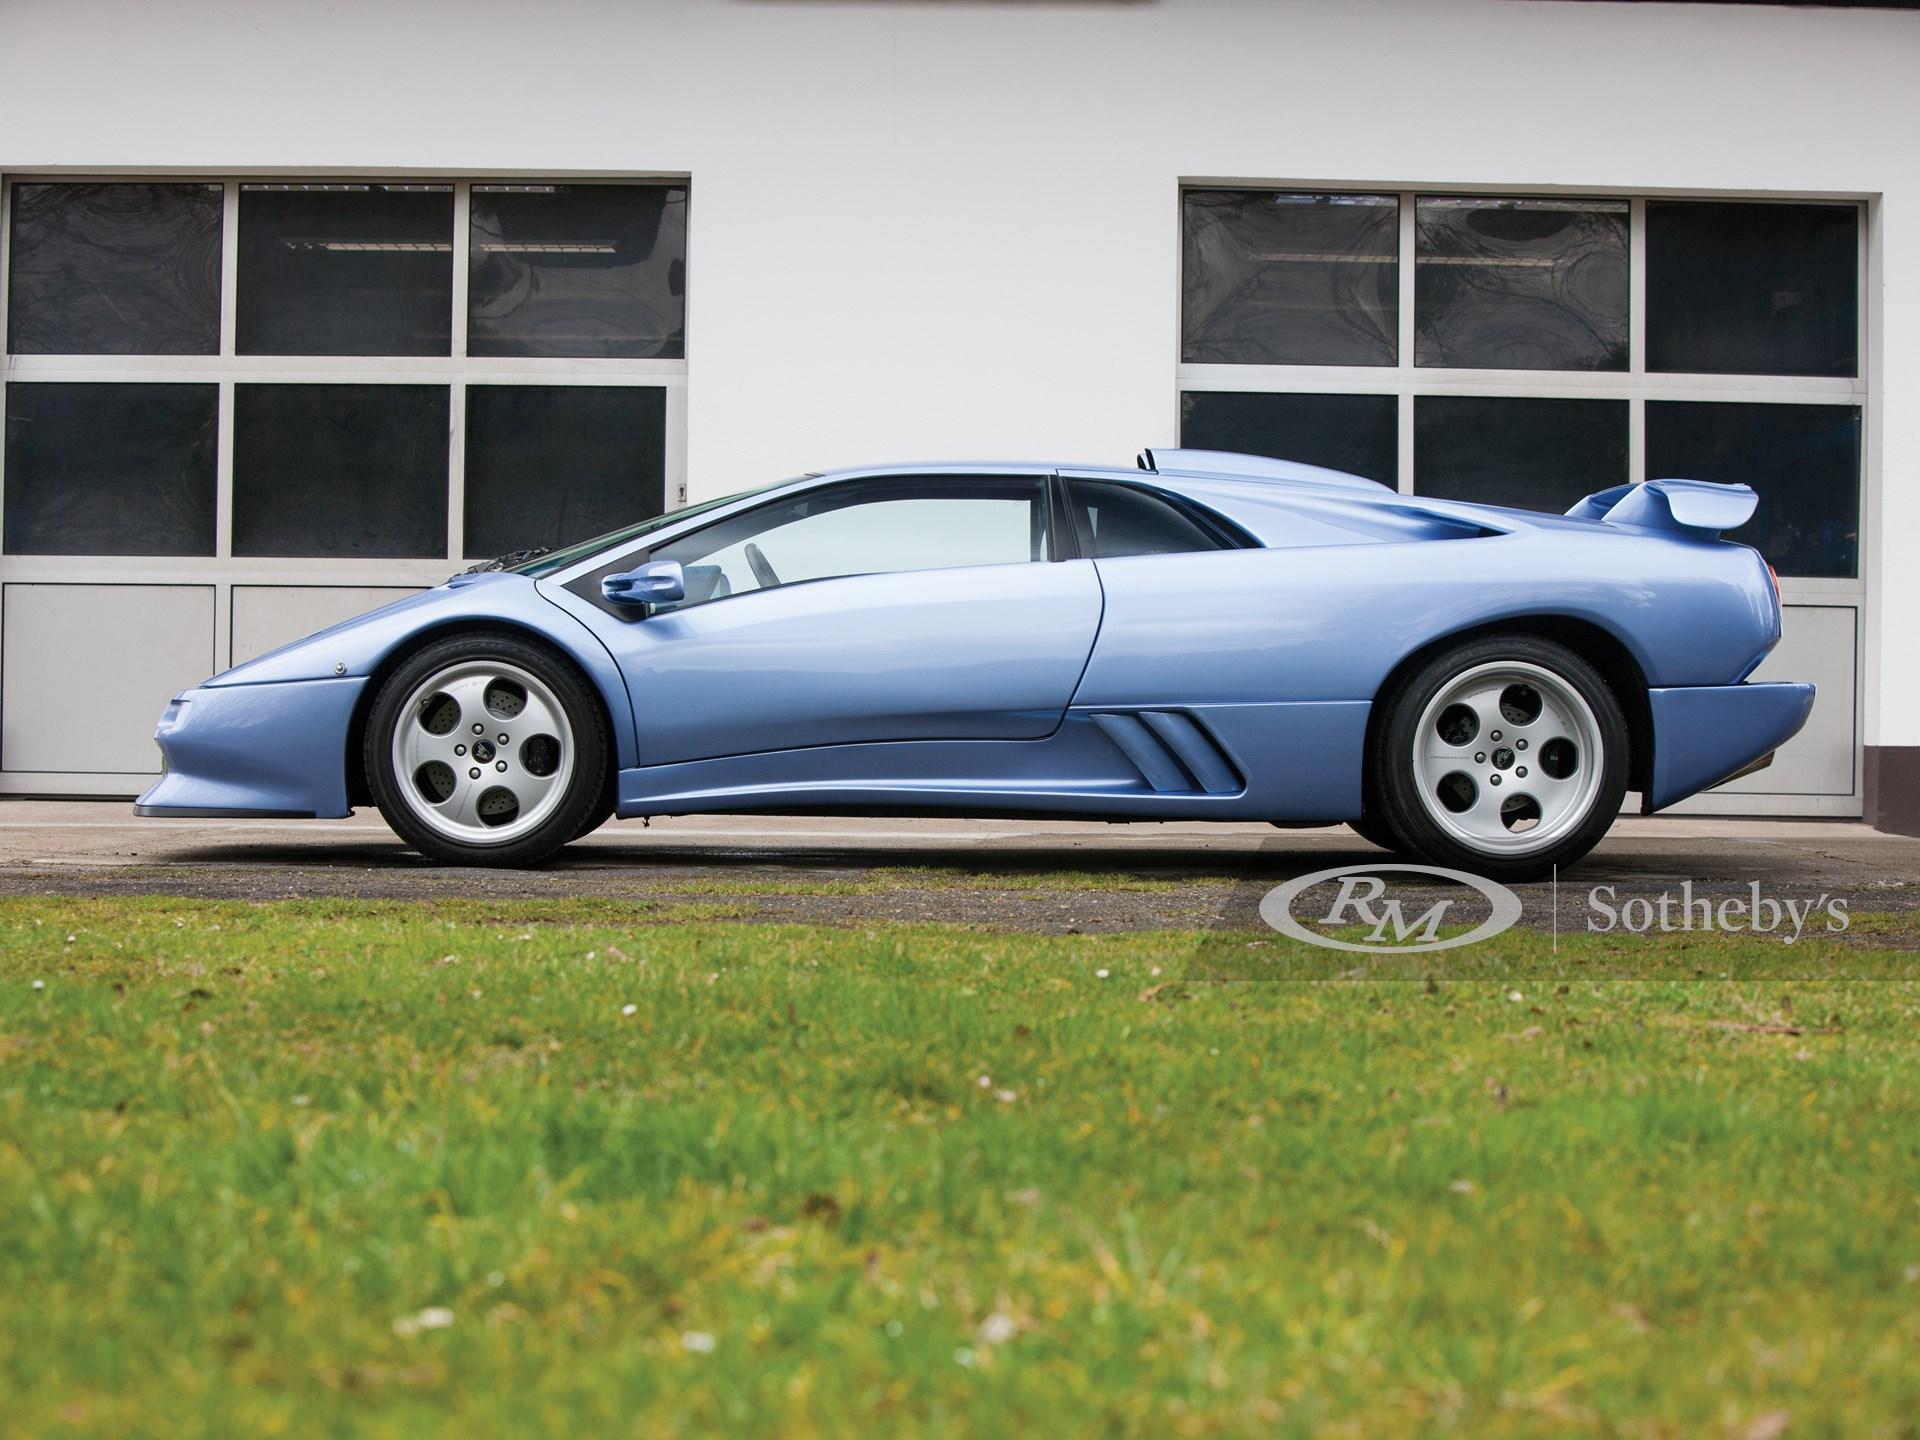 1995 Lamborghini Diablo SE30 Jota  -